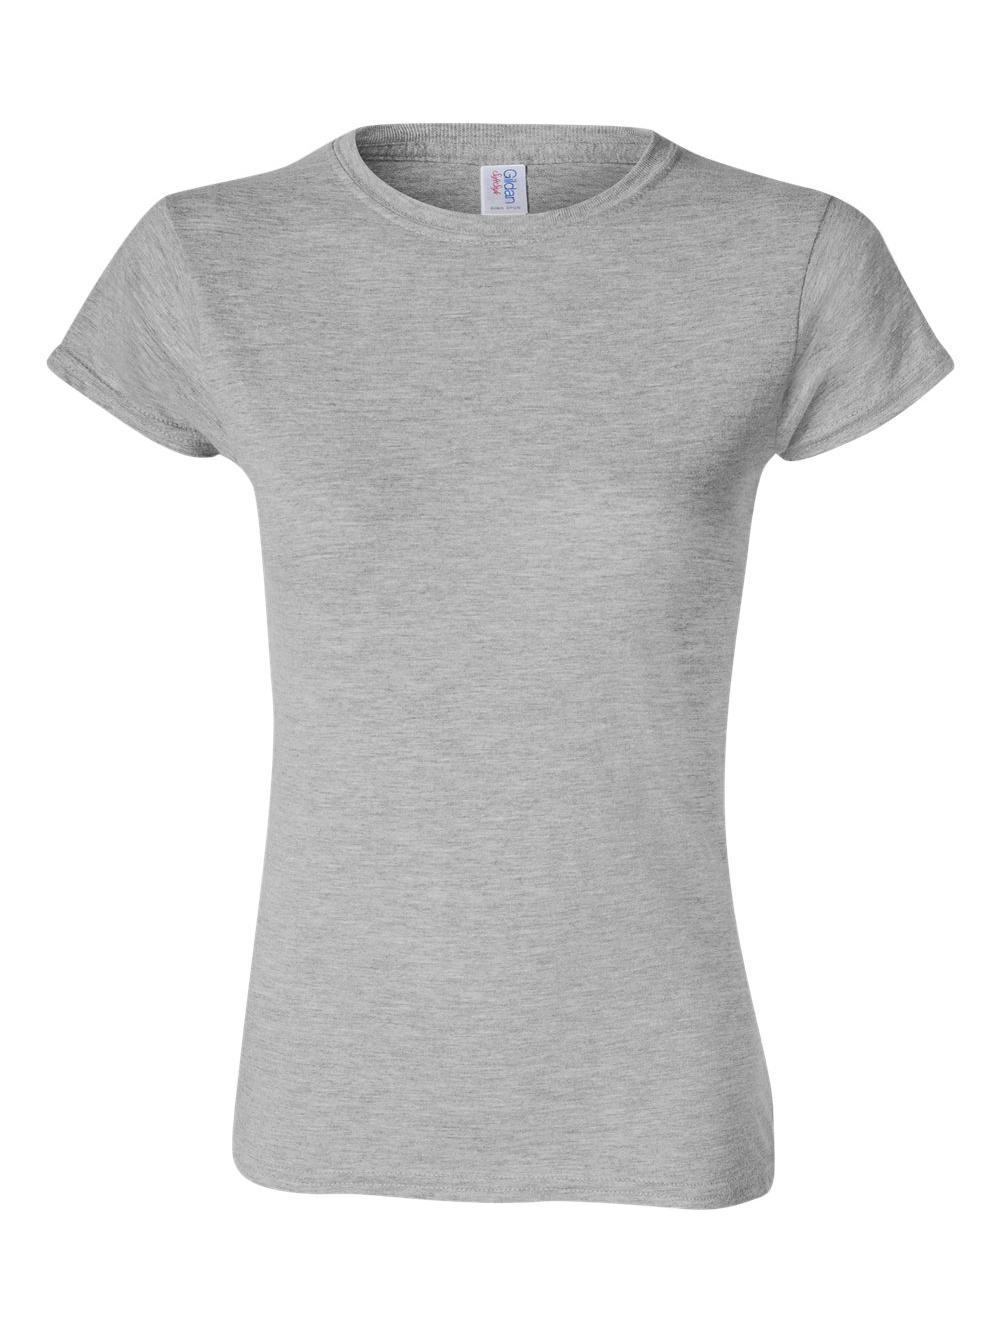 Gildan-Softstyle-Women-039-s-T-Shirt-64000L thumbnail 42